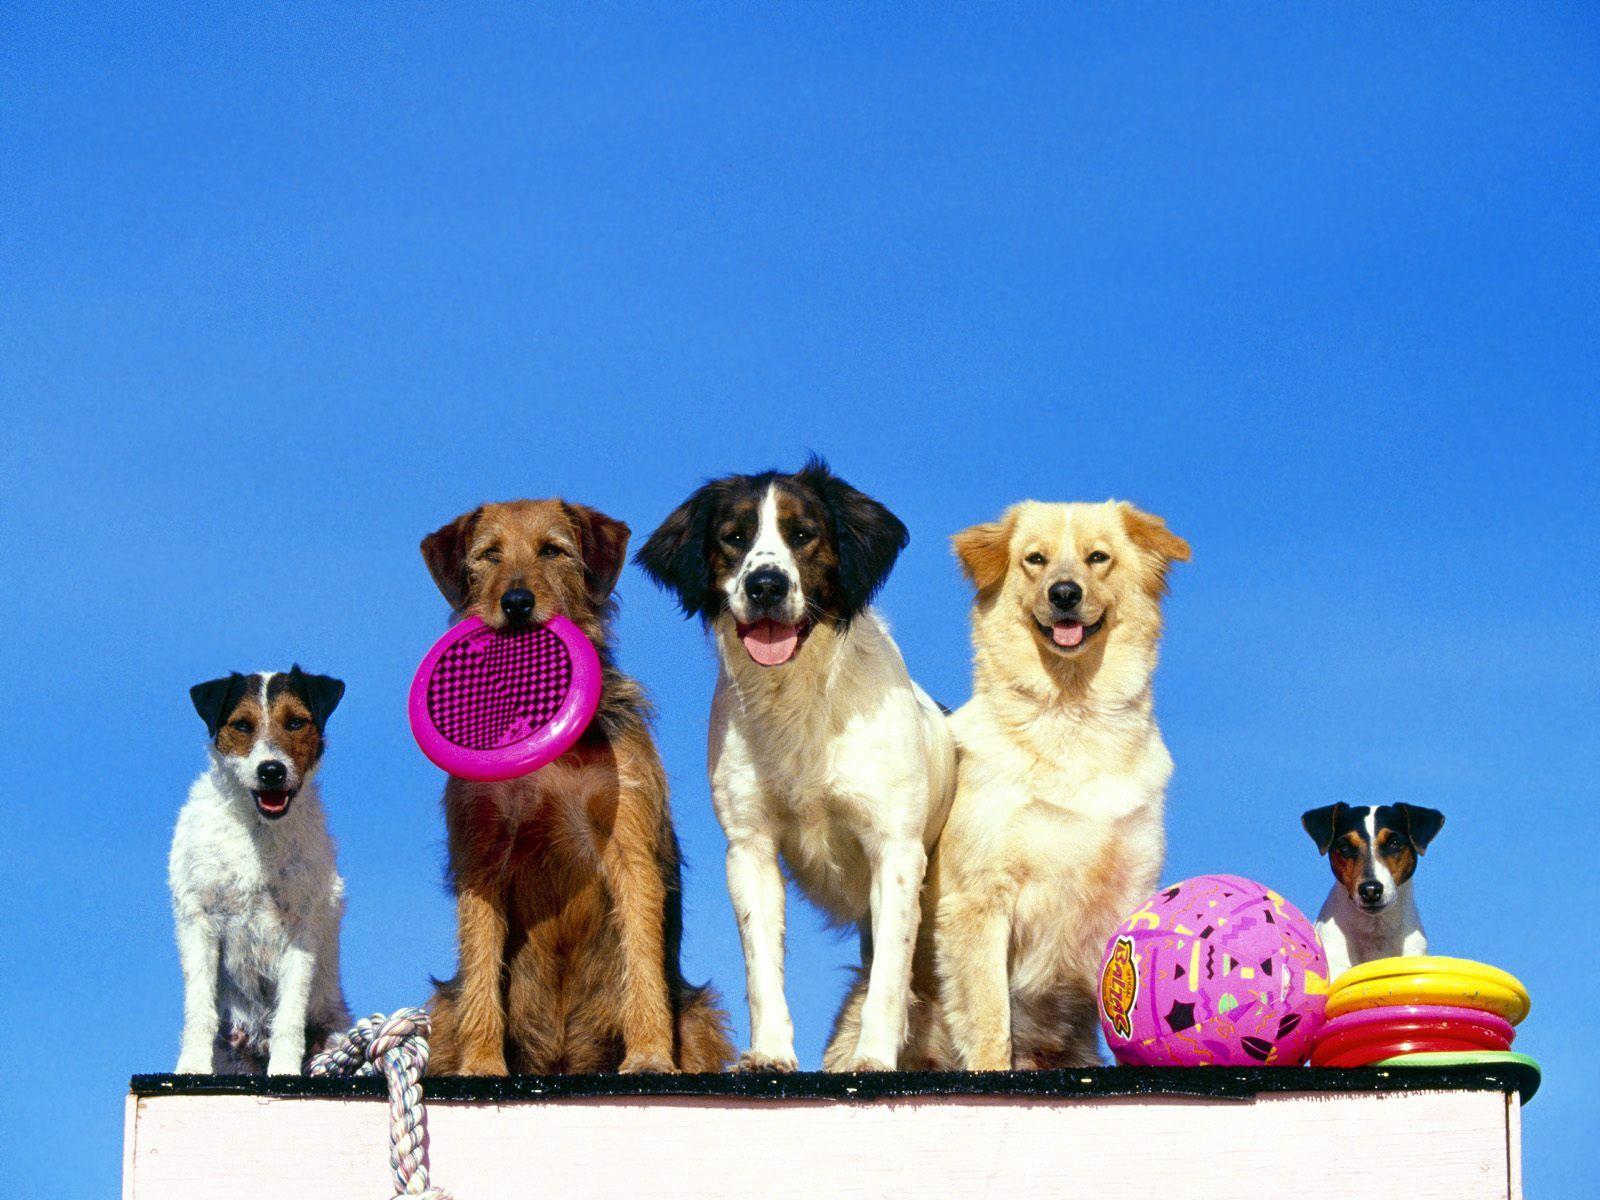 9a363c17ad0465768d291d7caddf0f21 it's summer time dogs, pets with frisbee cute pugs pinterest dog